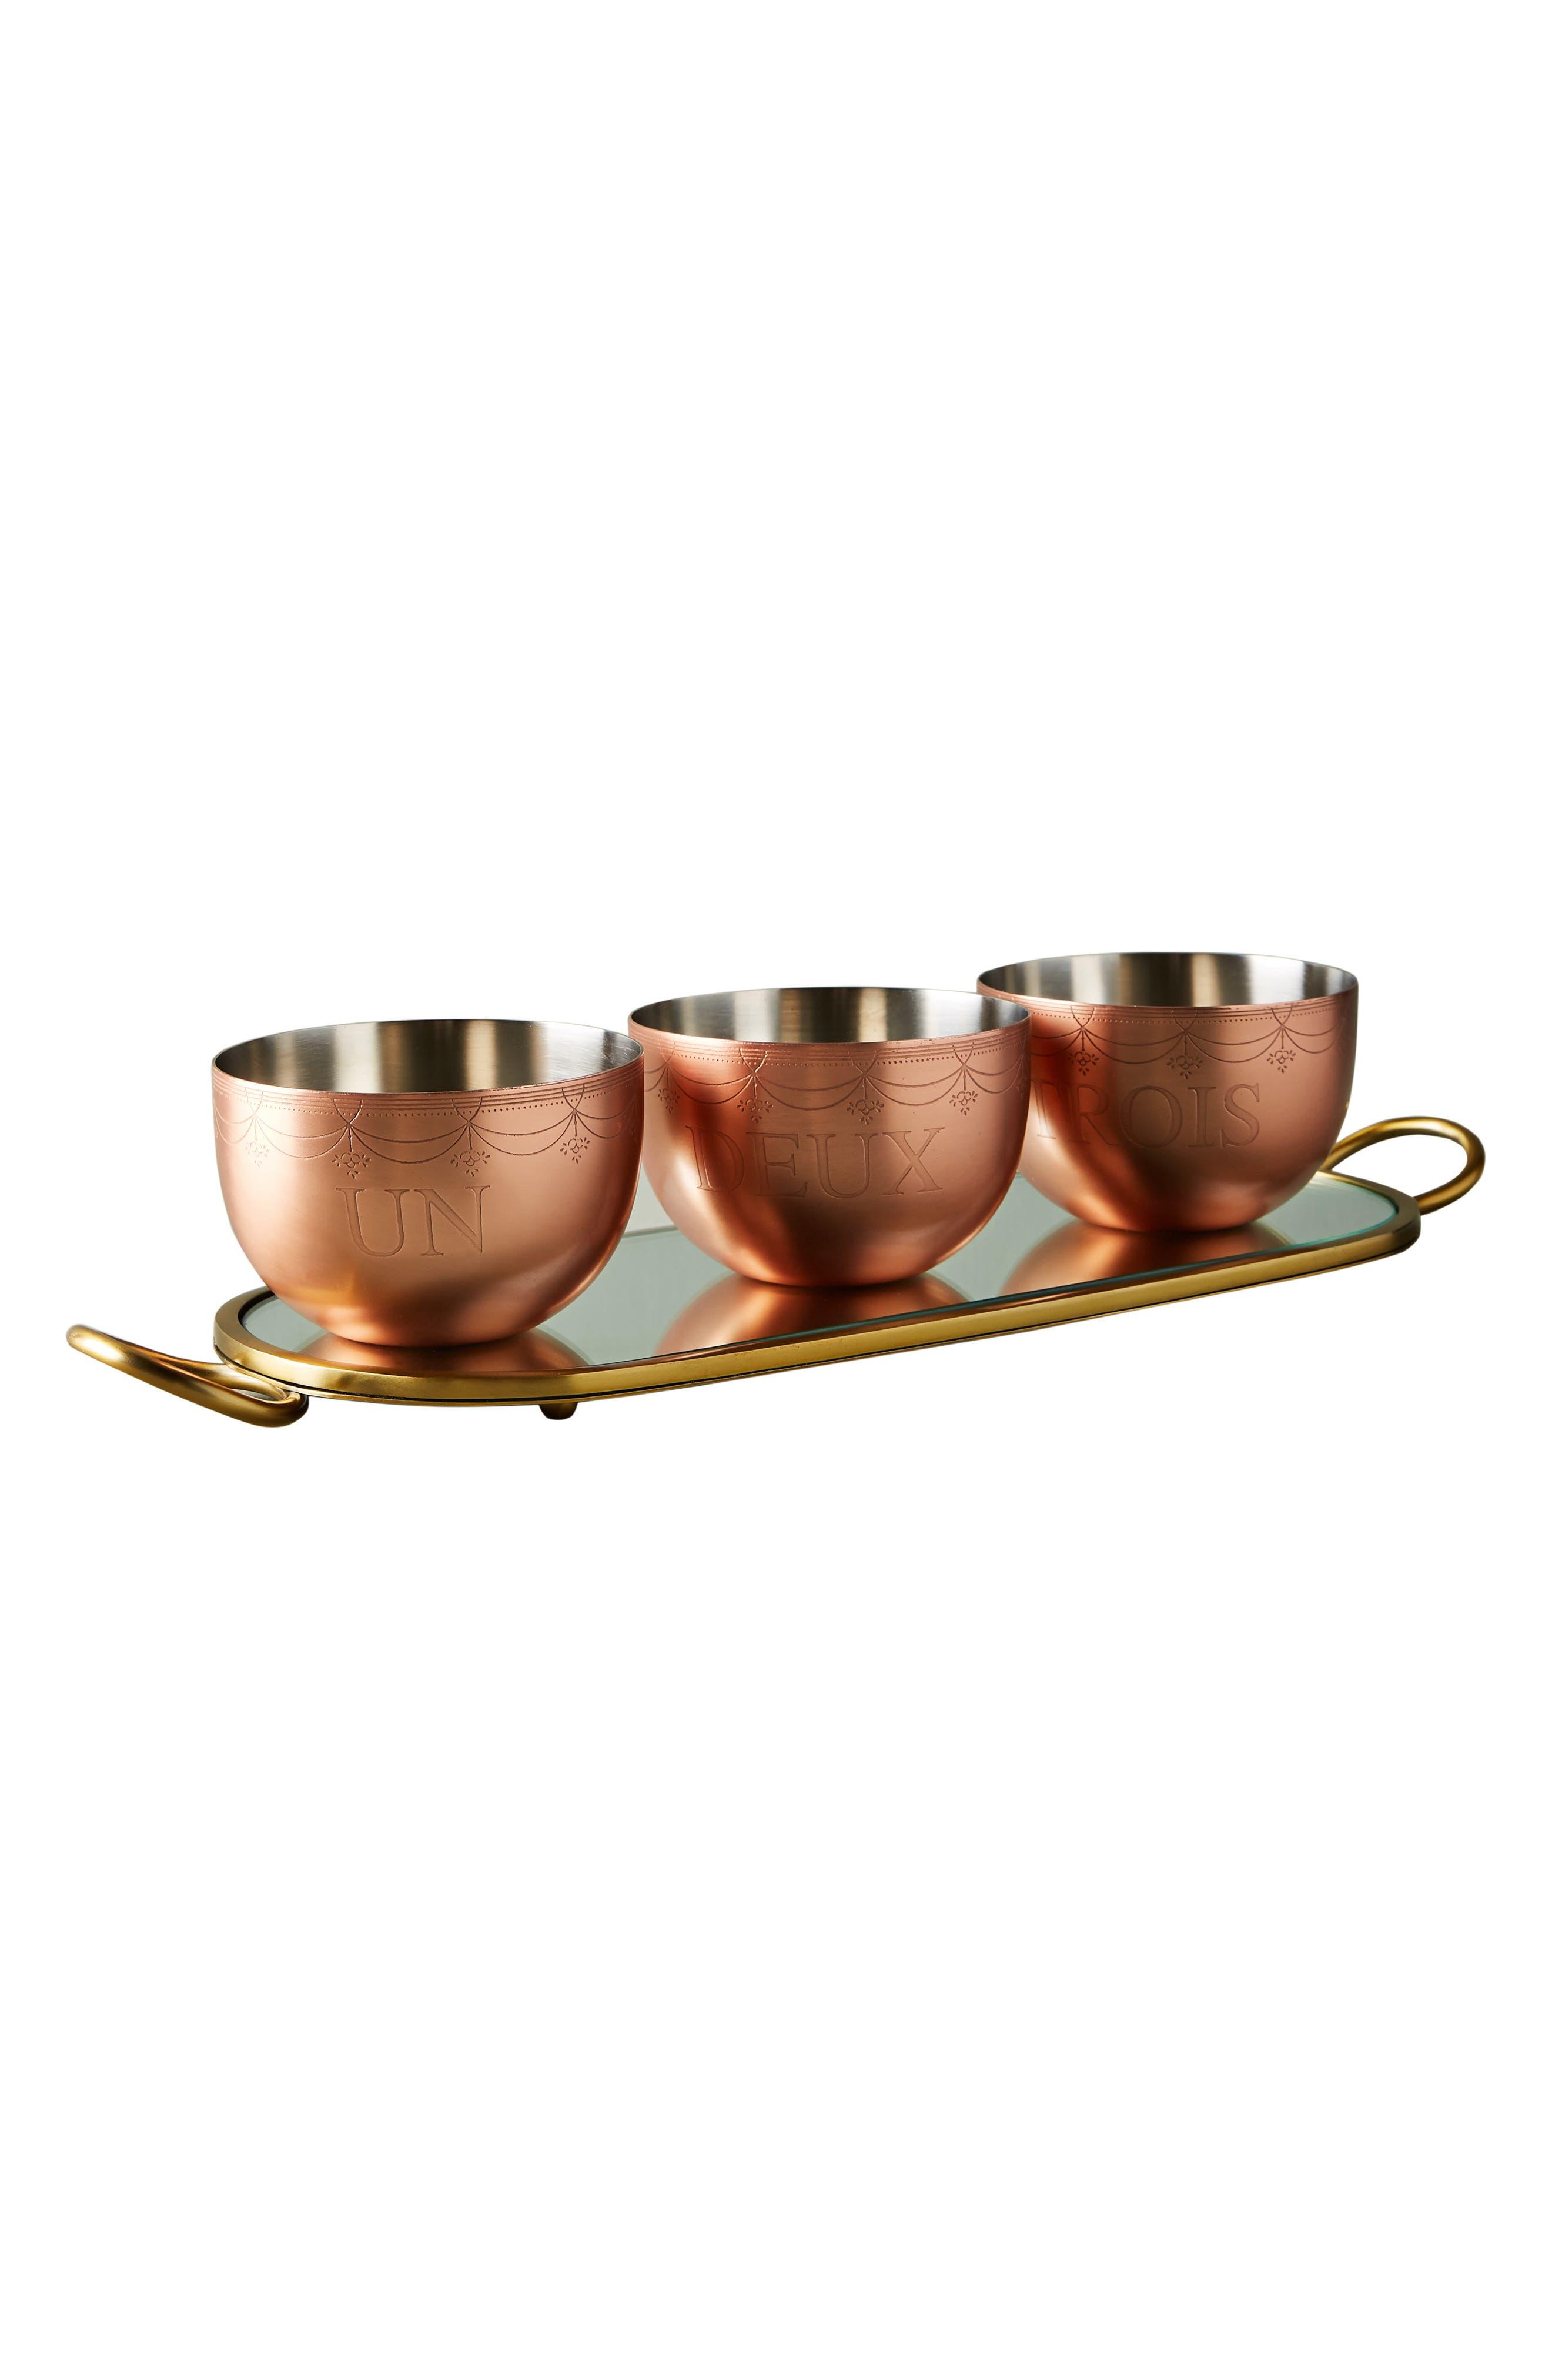 Lanna Tray & Bowl Set,                             Alternate thumbnail 3, color,                             ROSE GOLD